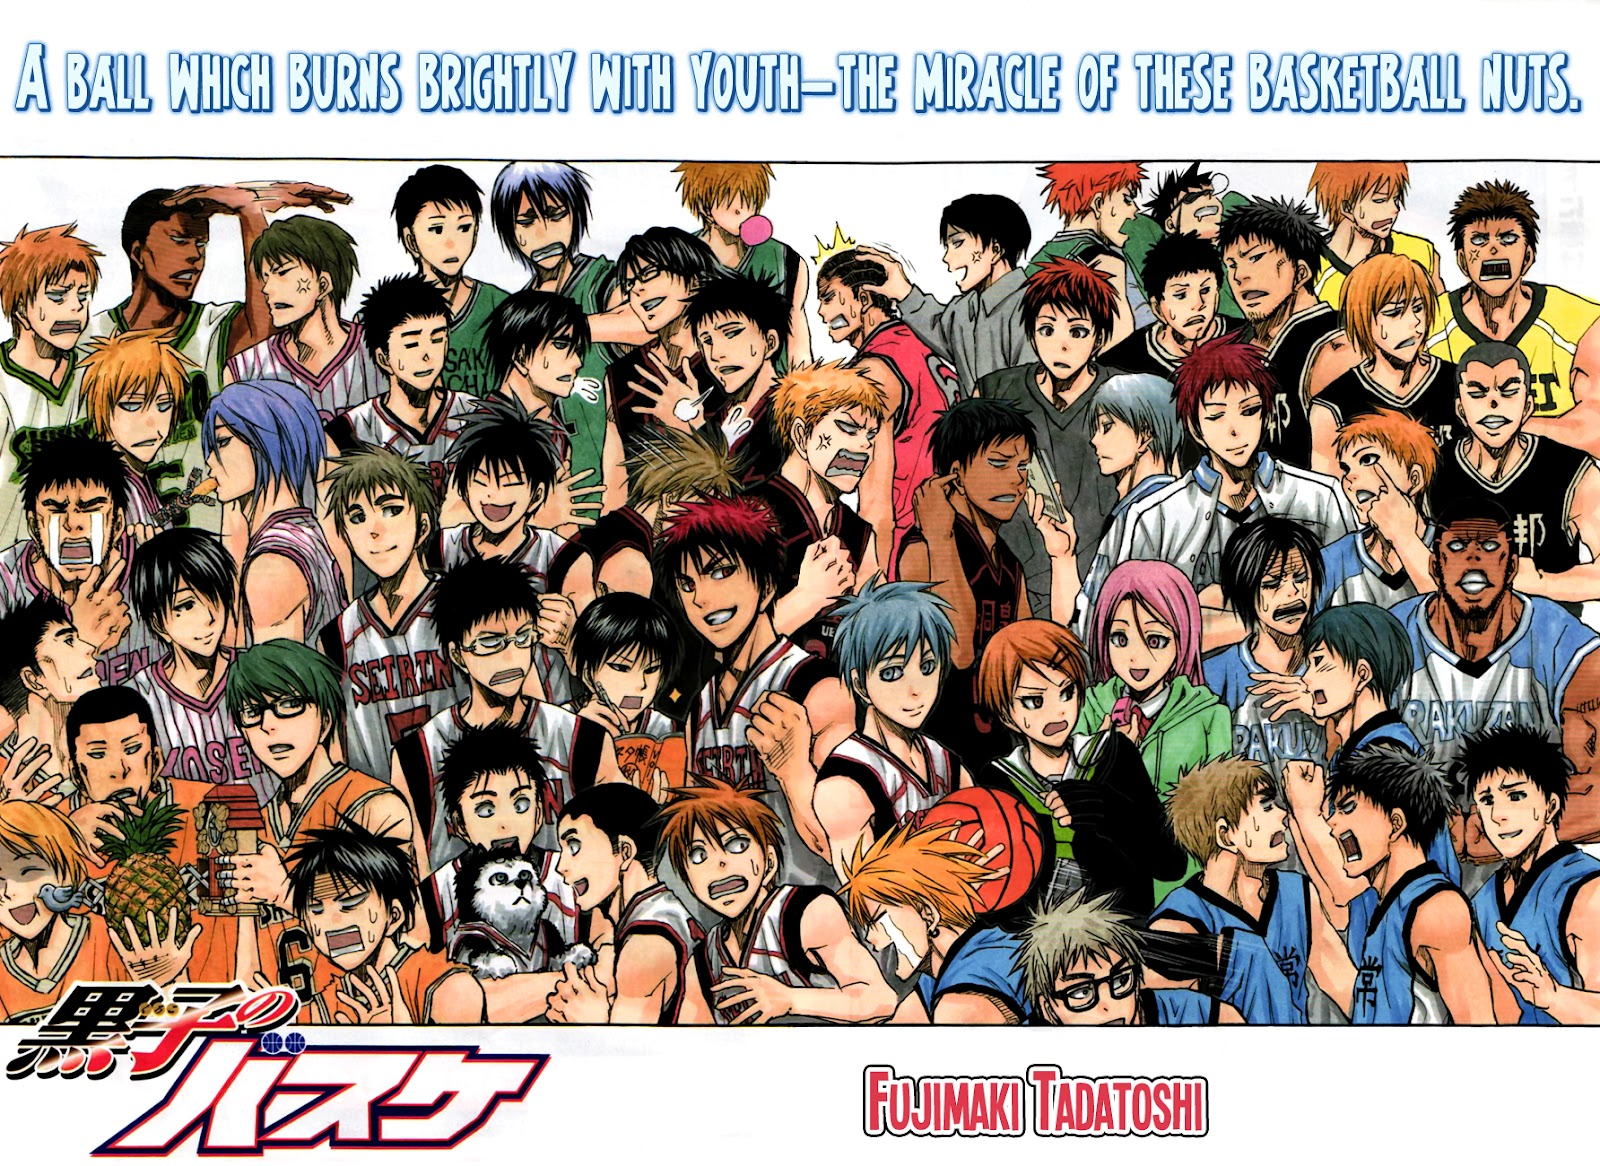 Kuroko no Basket Manga Chapter 274 - Image 02-03